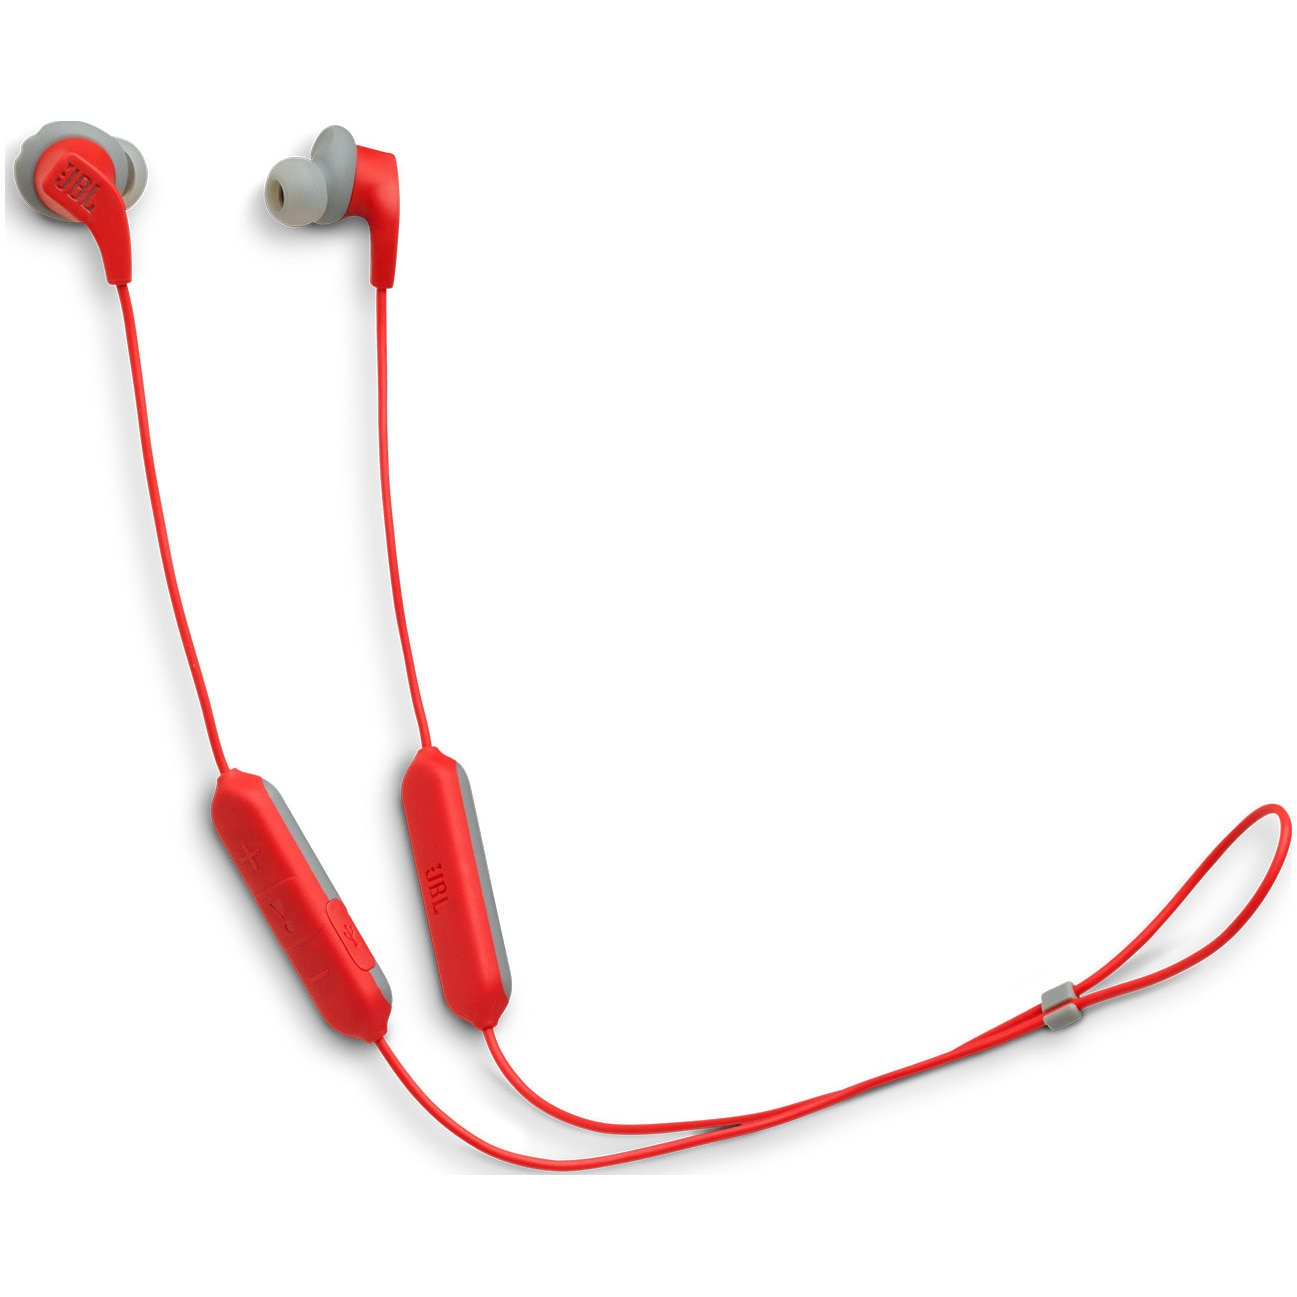 Fotografie Casti sport In-Ear JBL Endurance Run, Wireless Bluetooth, Sweatproof IPX5, Hands-free, Fliphook, Playback 6h, Rosu